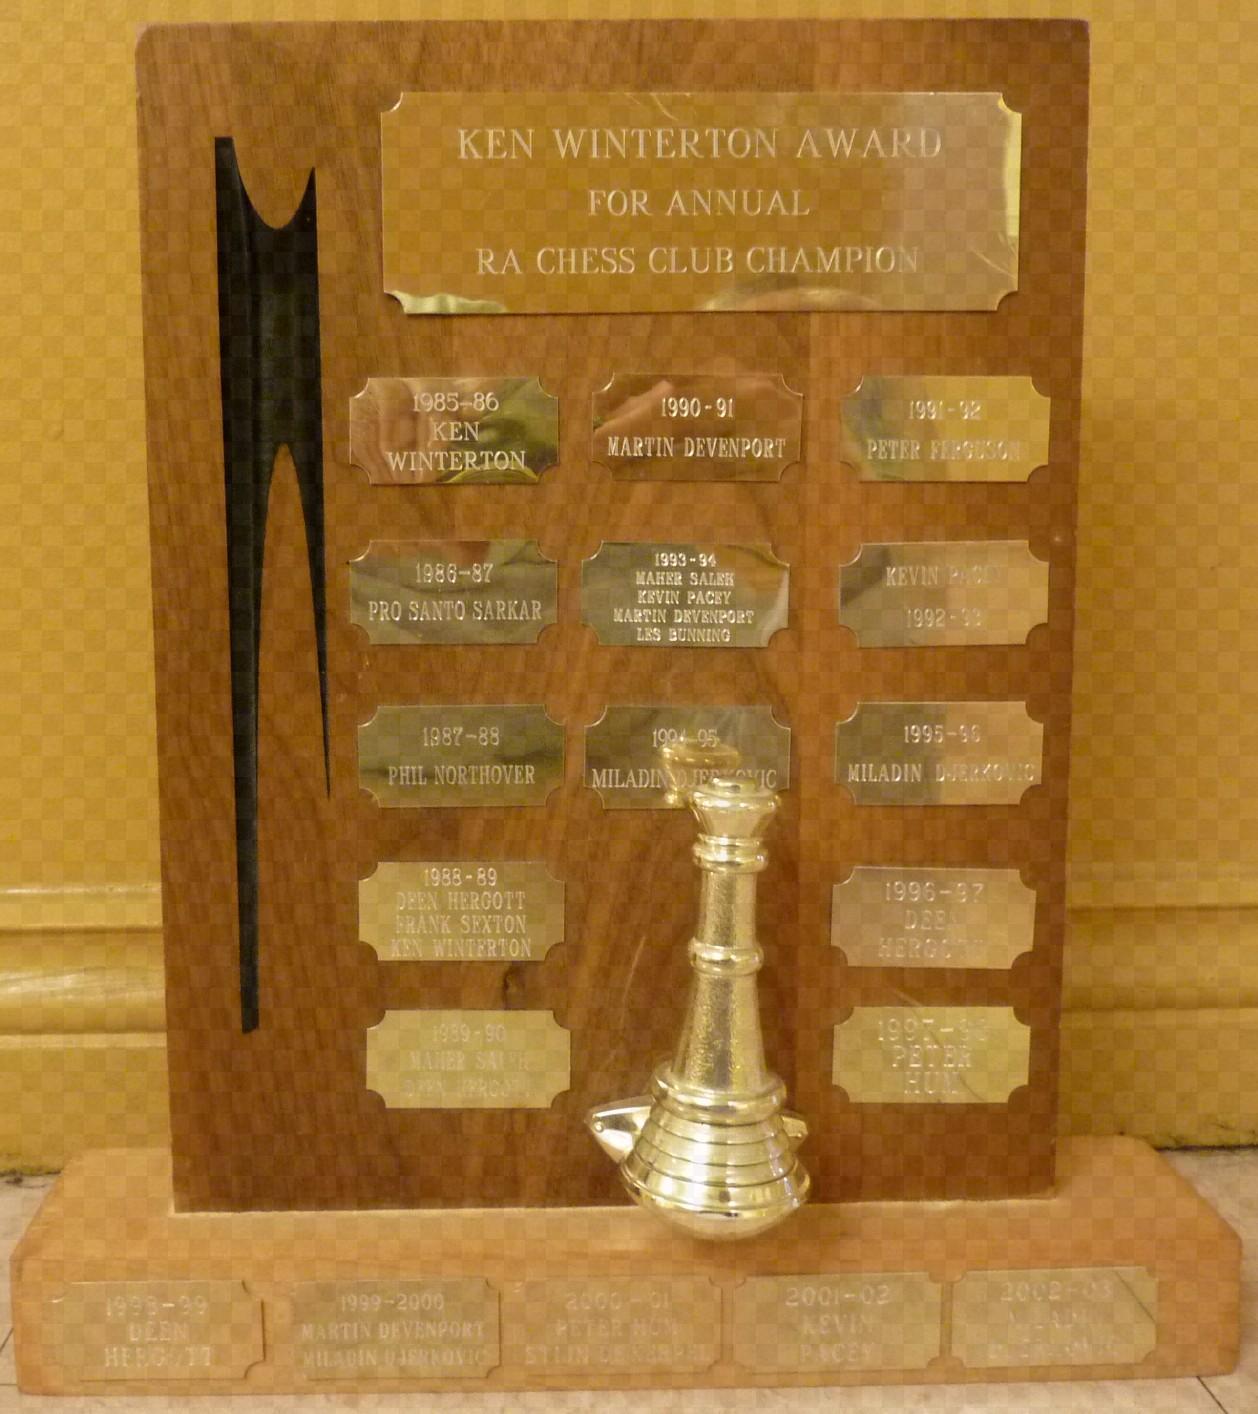 Ken Winterton Award